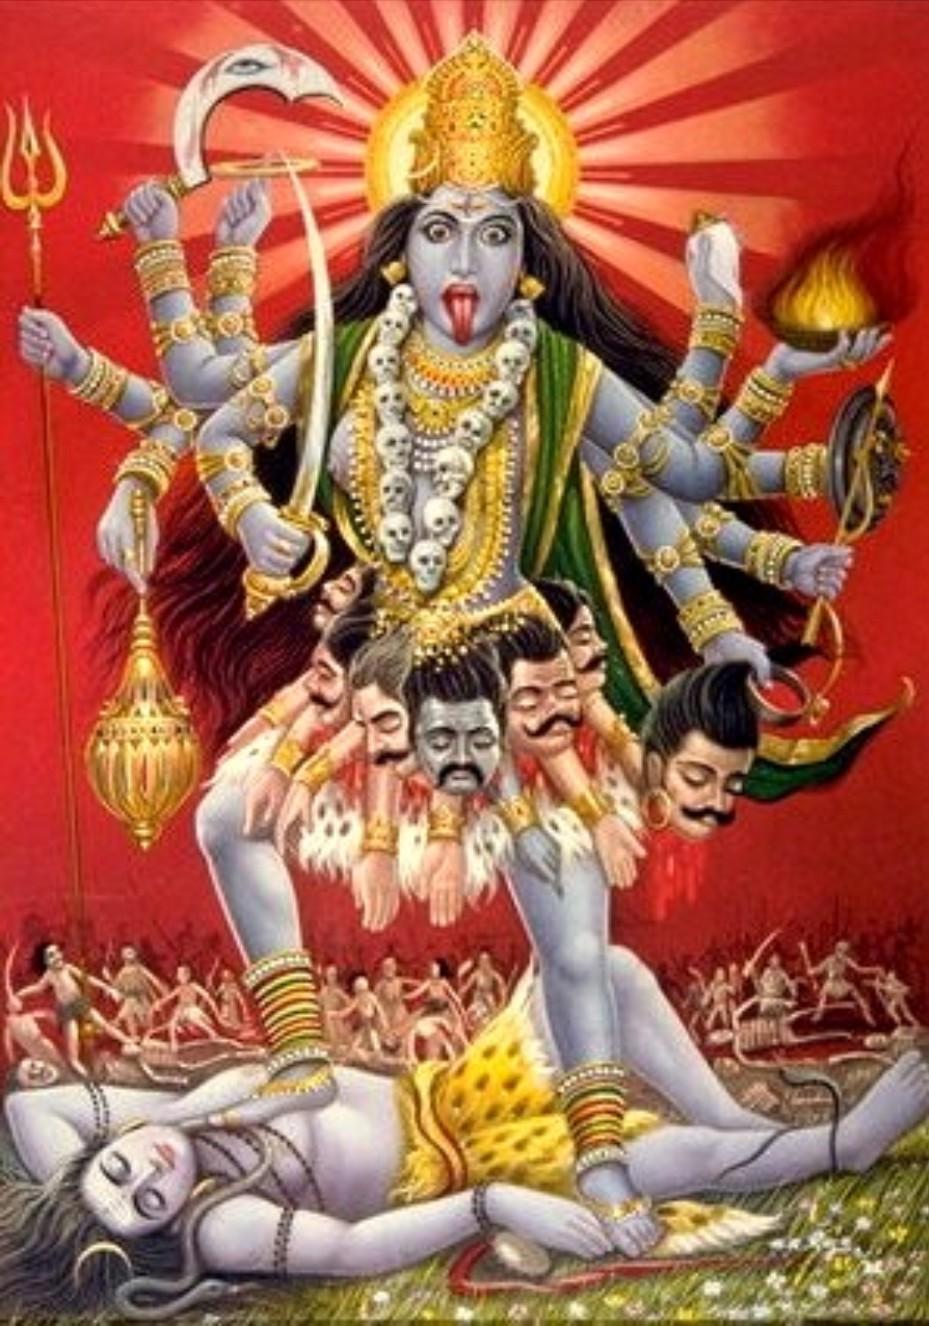 Kali Hindu Goddess of Death